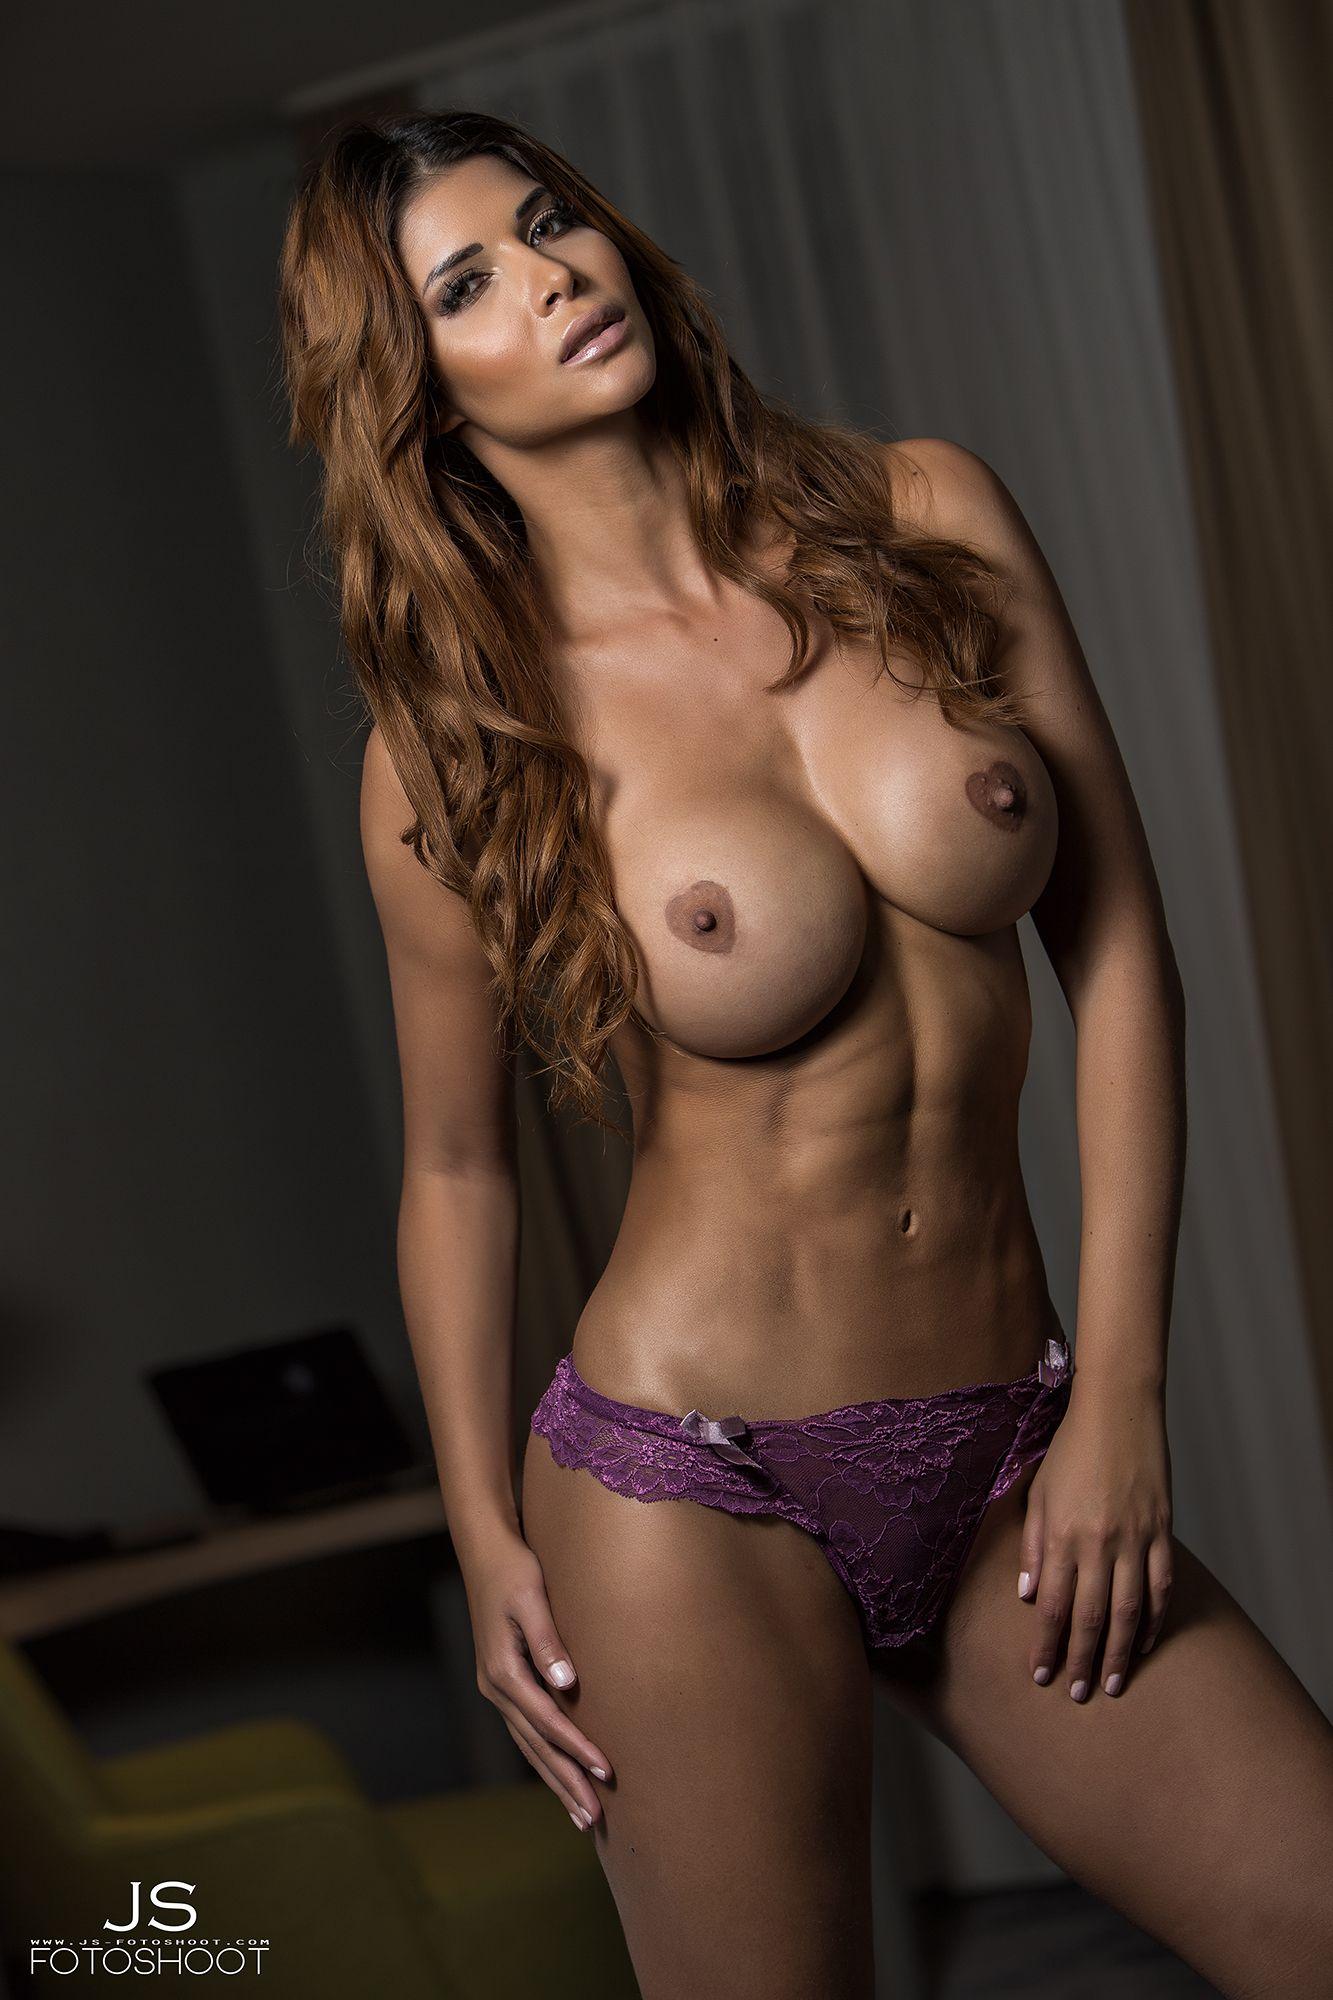 Micaela Schafer Sexy - 8 New Photos nudes (33 photo), Bikini Celebrity images